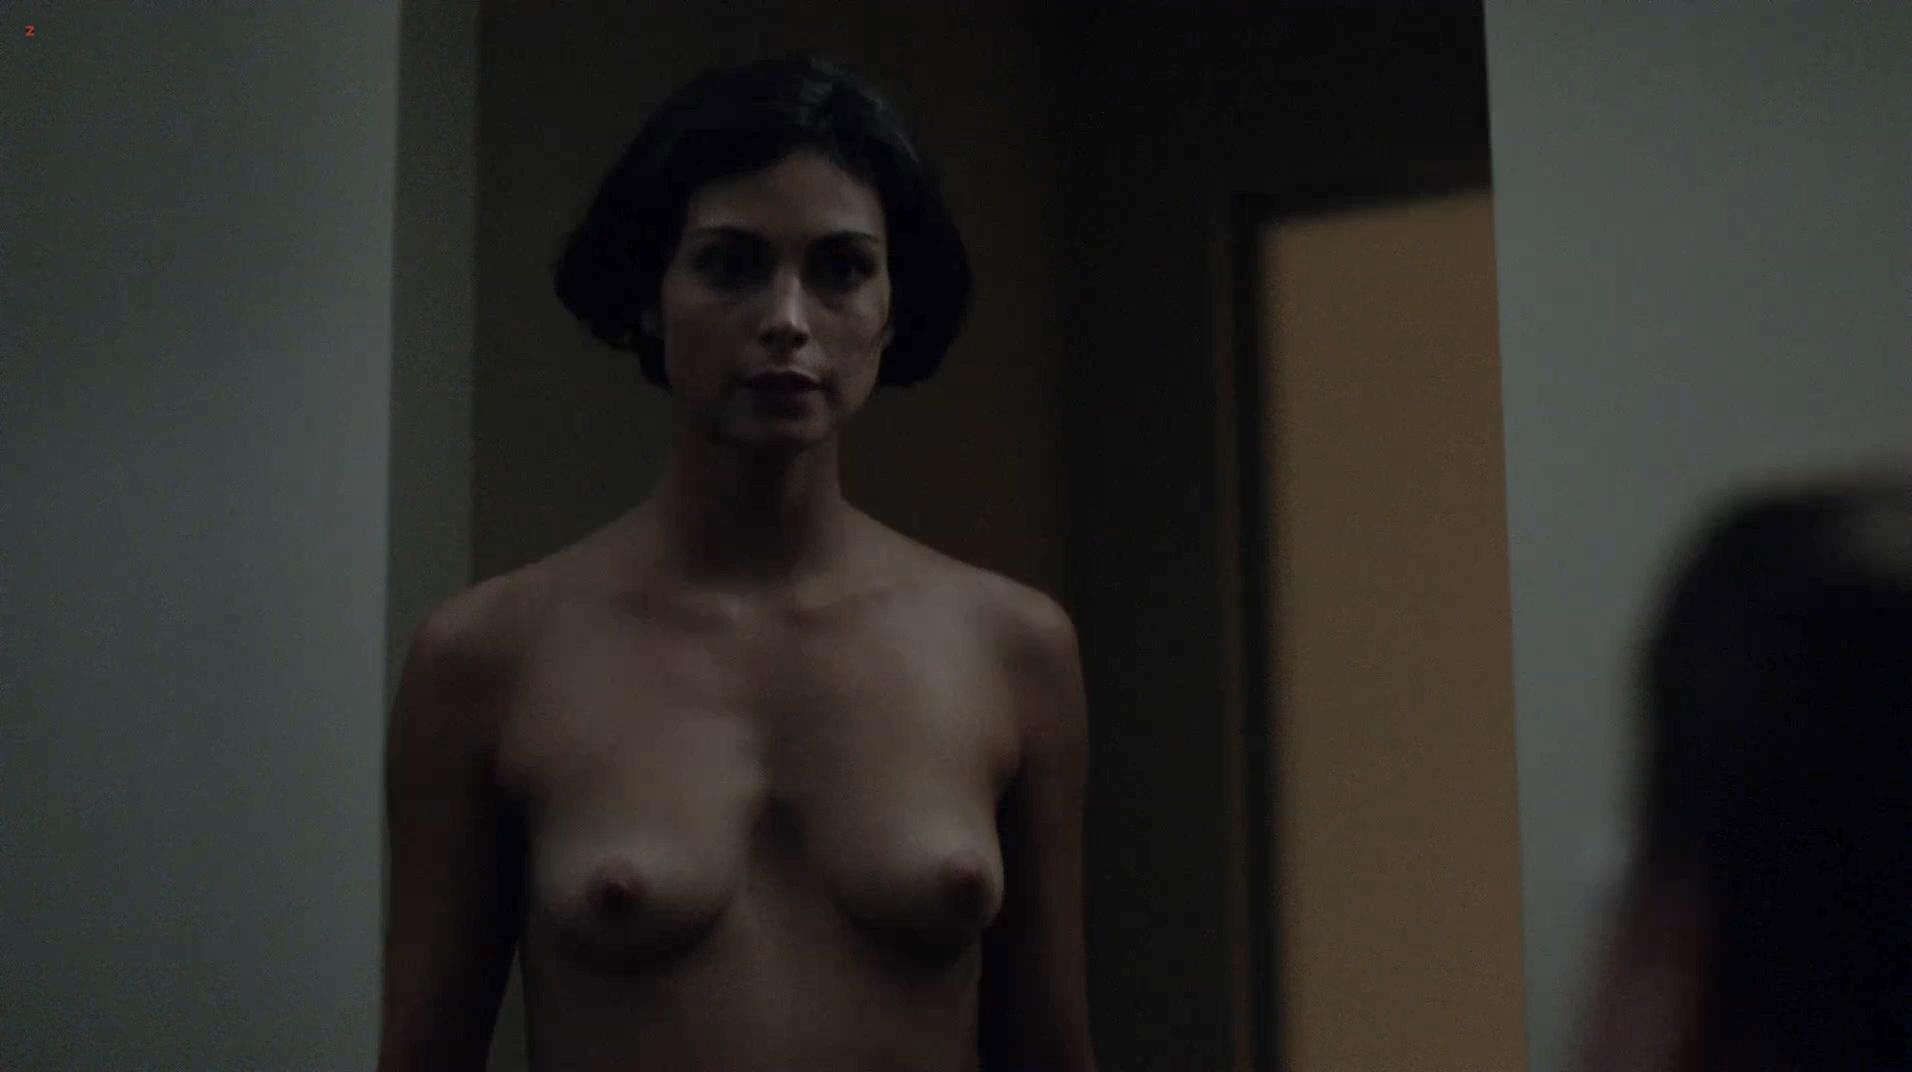 panties Celebrites Vanessa Daly naked photo 2017